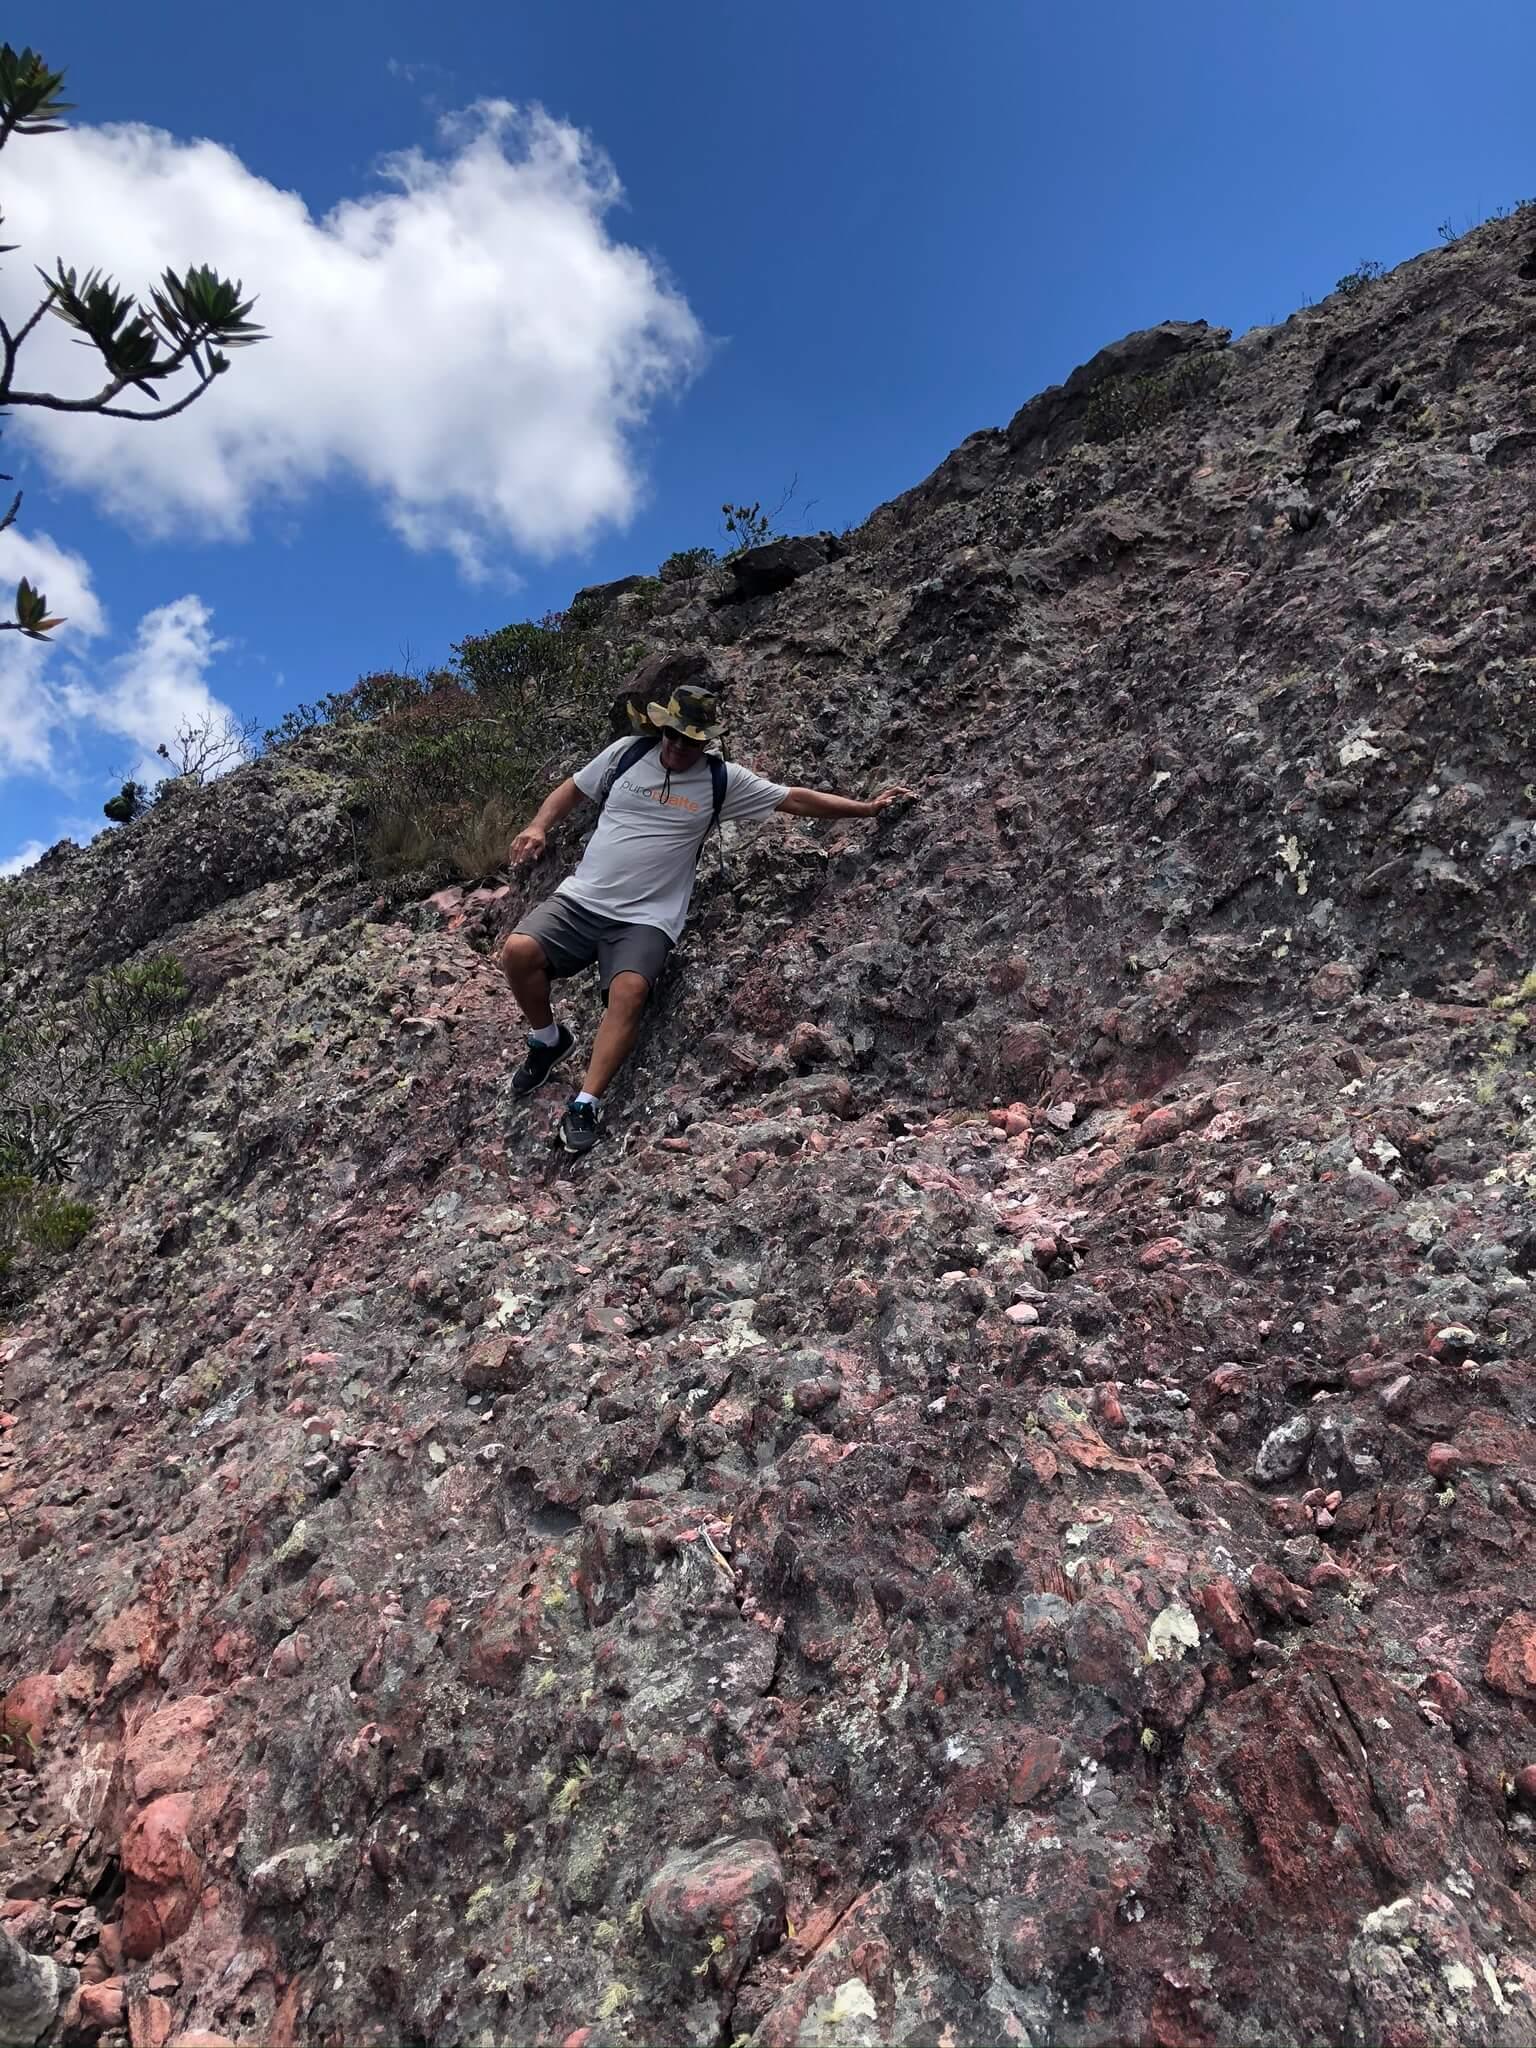 Descida-Pico-das-Almas